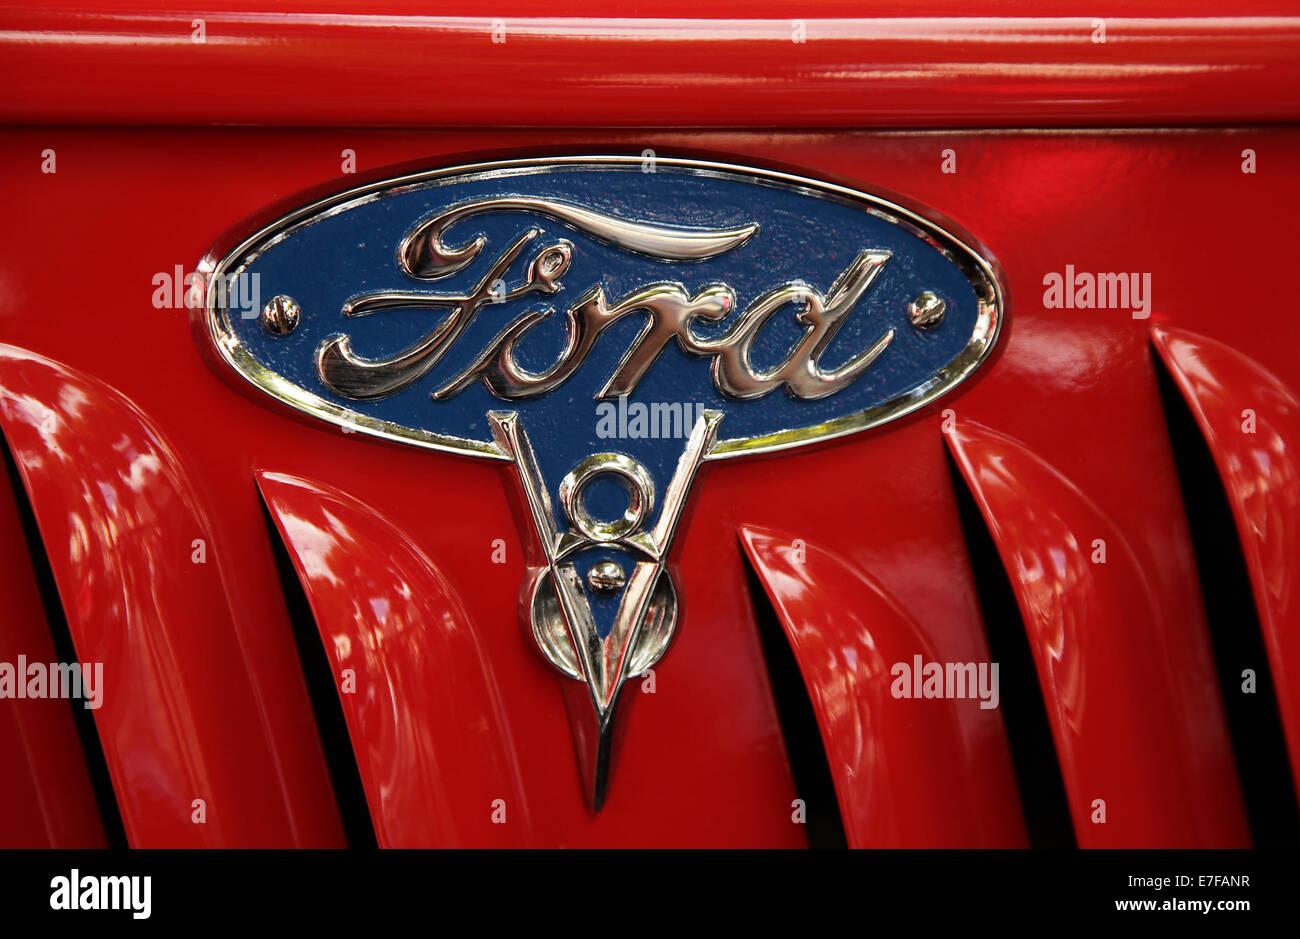 Ford Badge Emblem Icon Symbol Stock Photos Ford Badge Emblem Icon